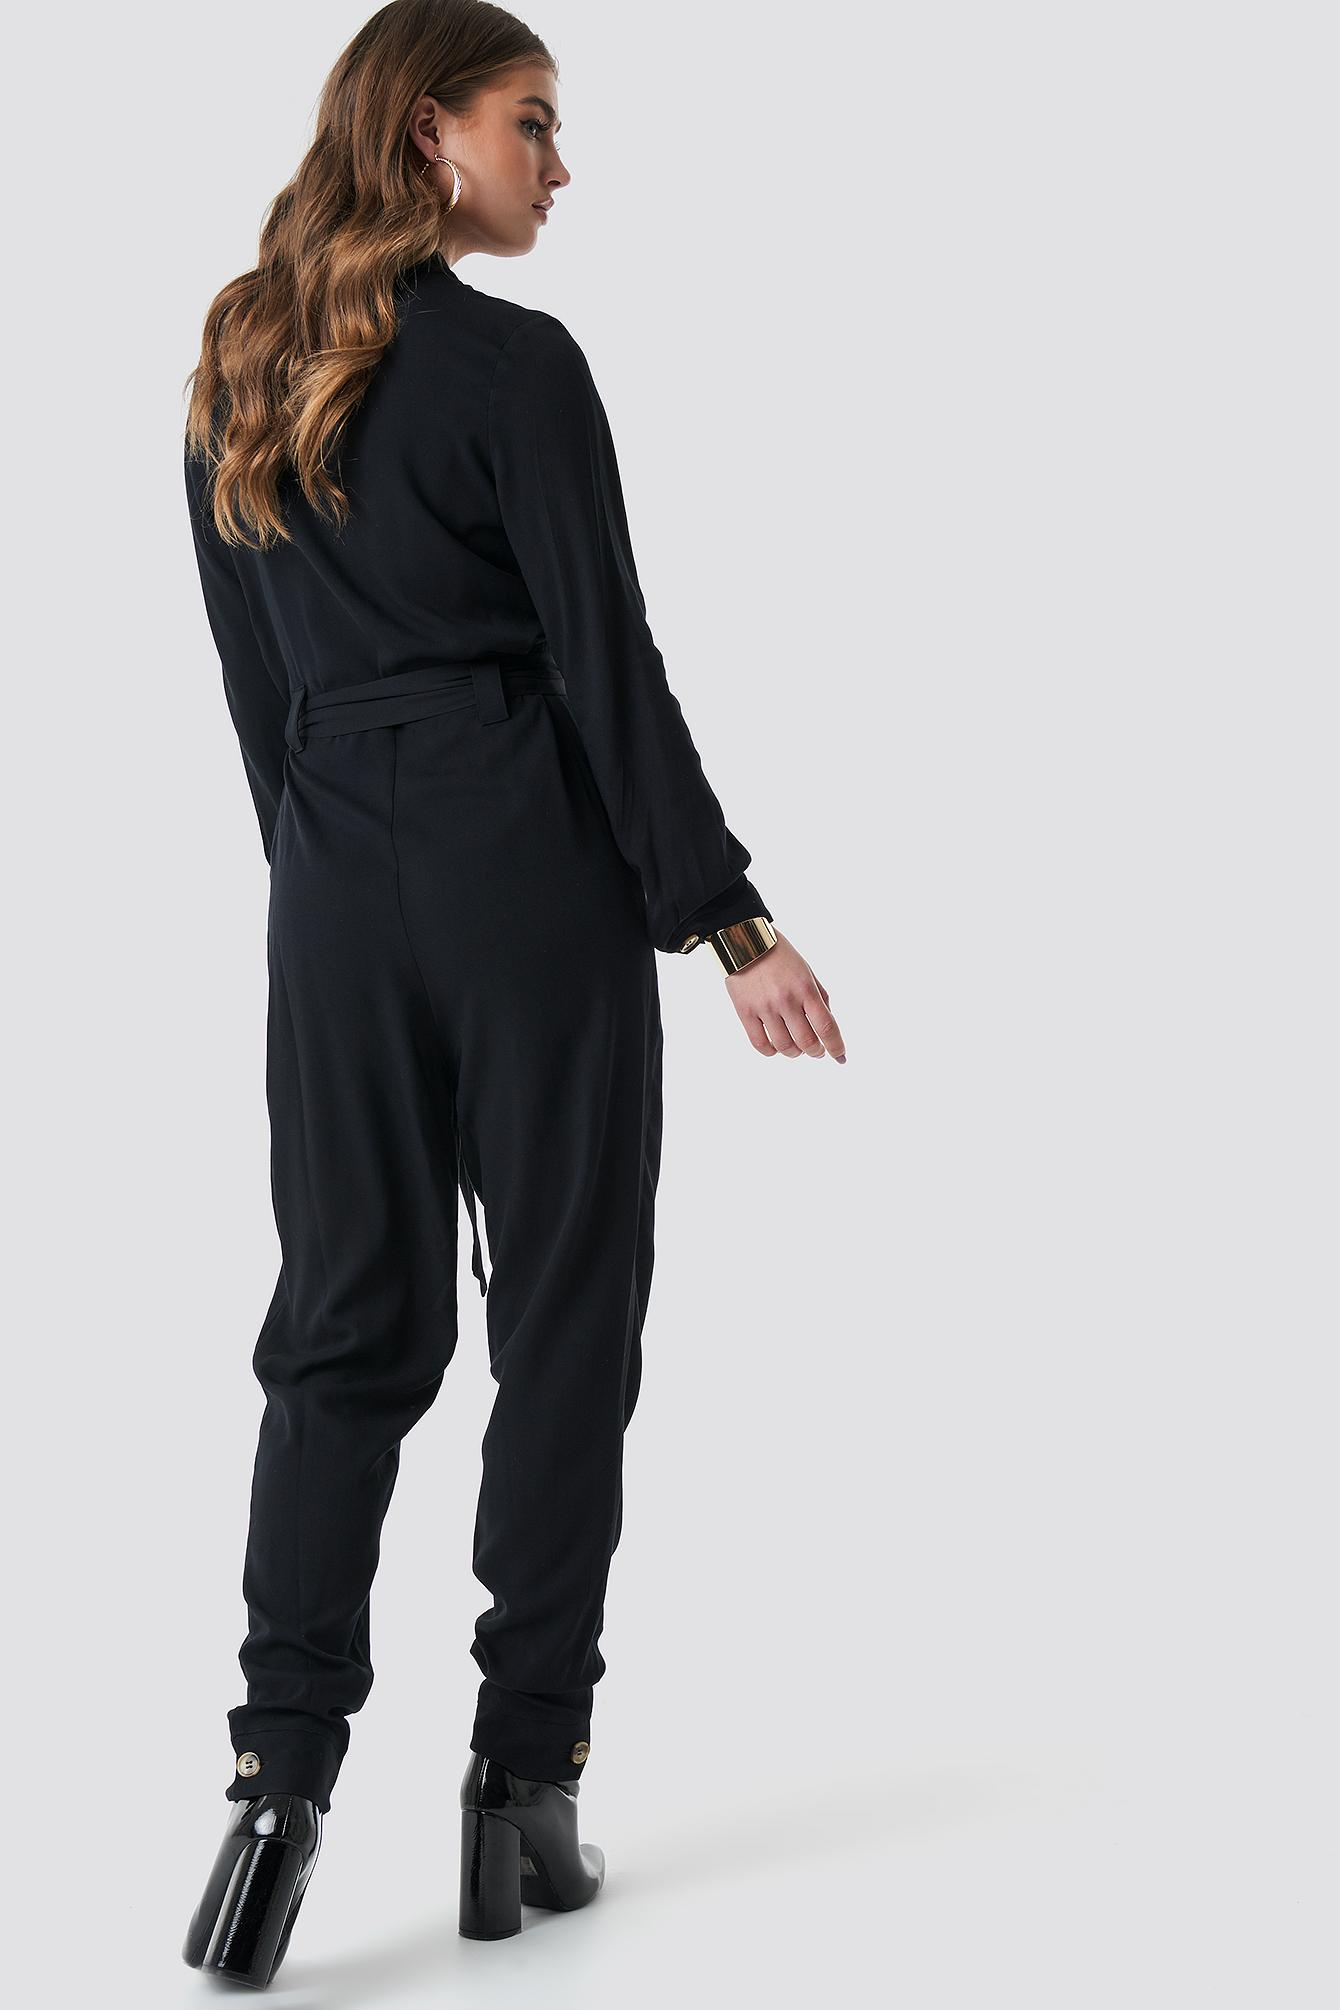 e92767b67322 Lyst - Na-Kd Tie Waist Button Up Jumpsuit Black in Black